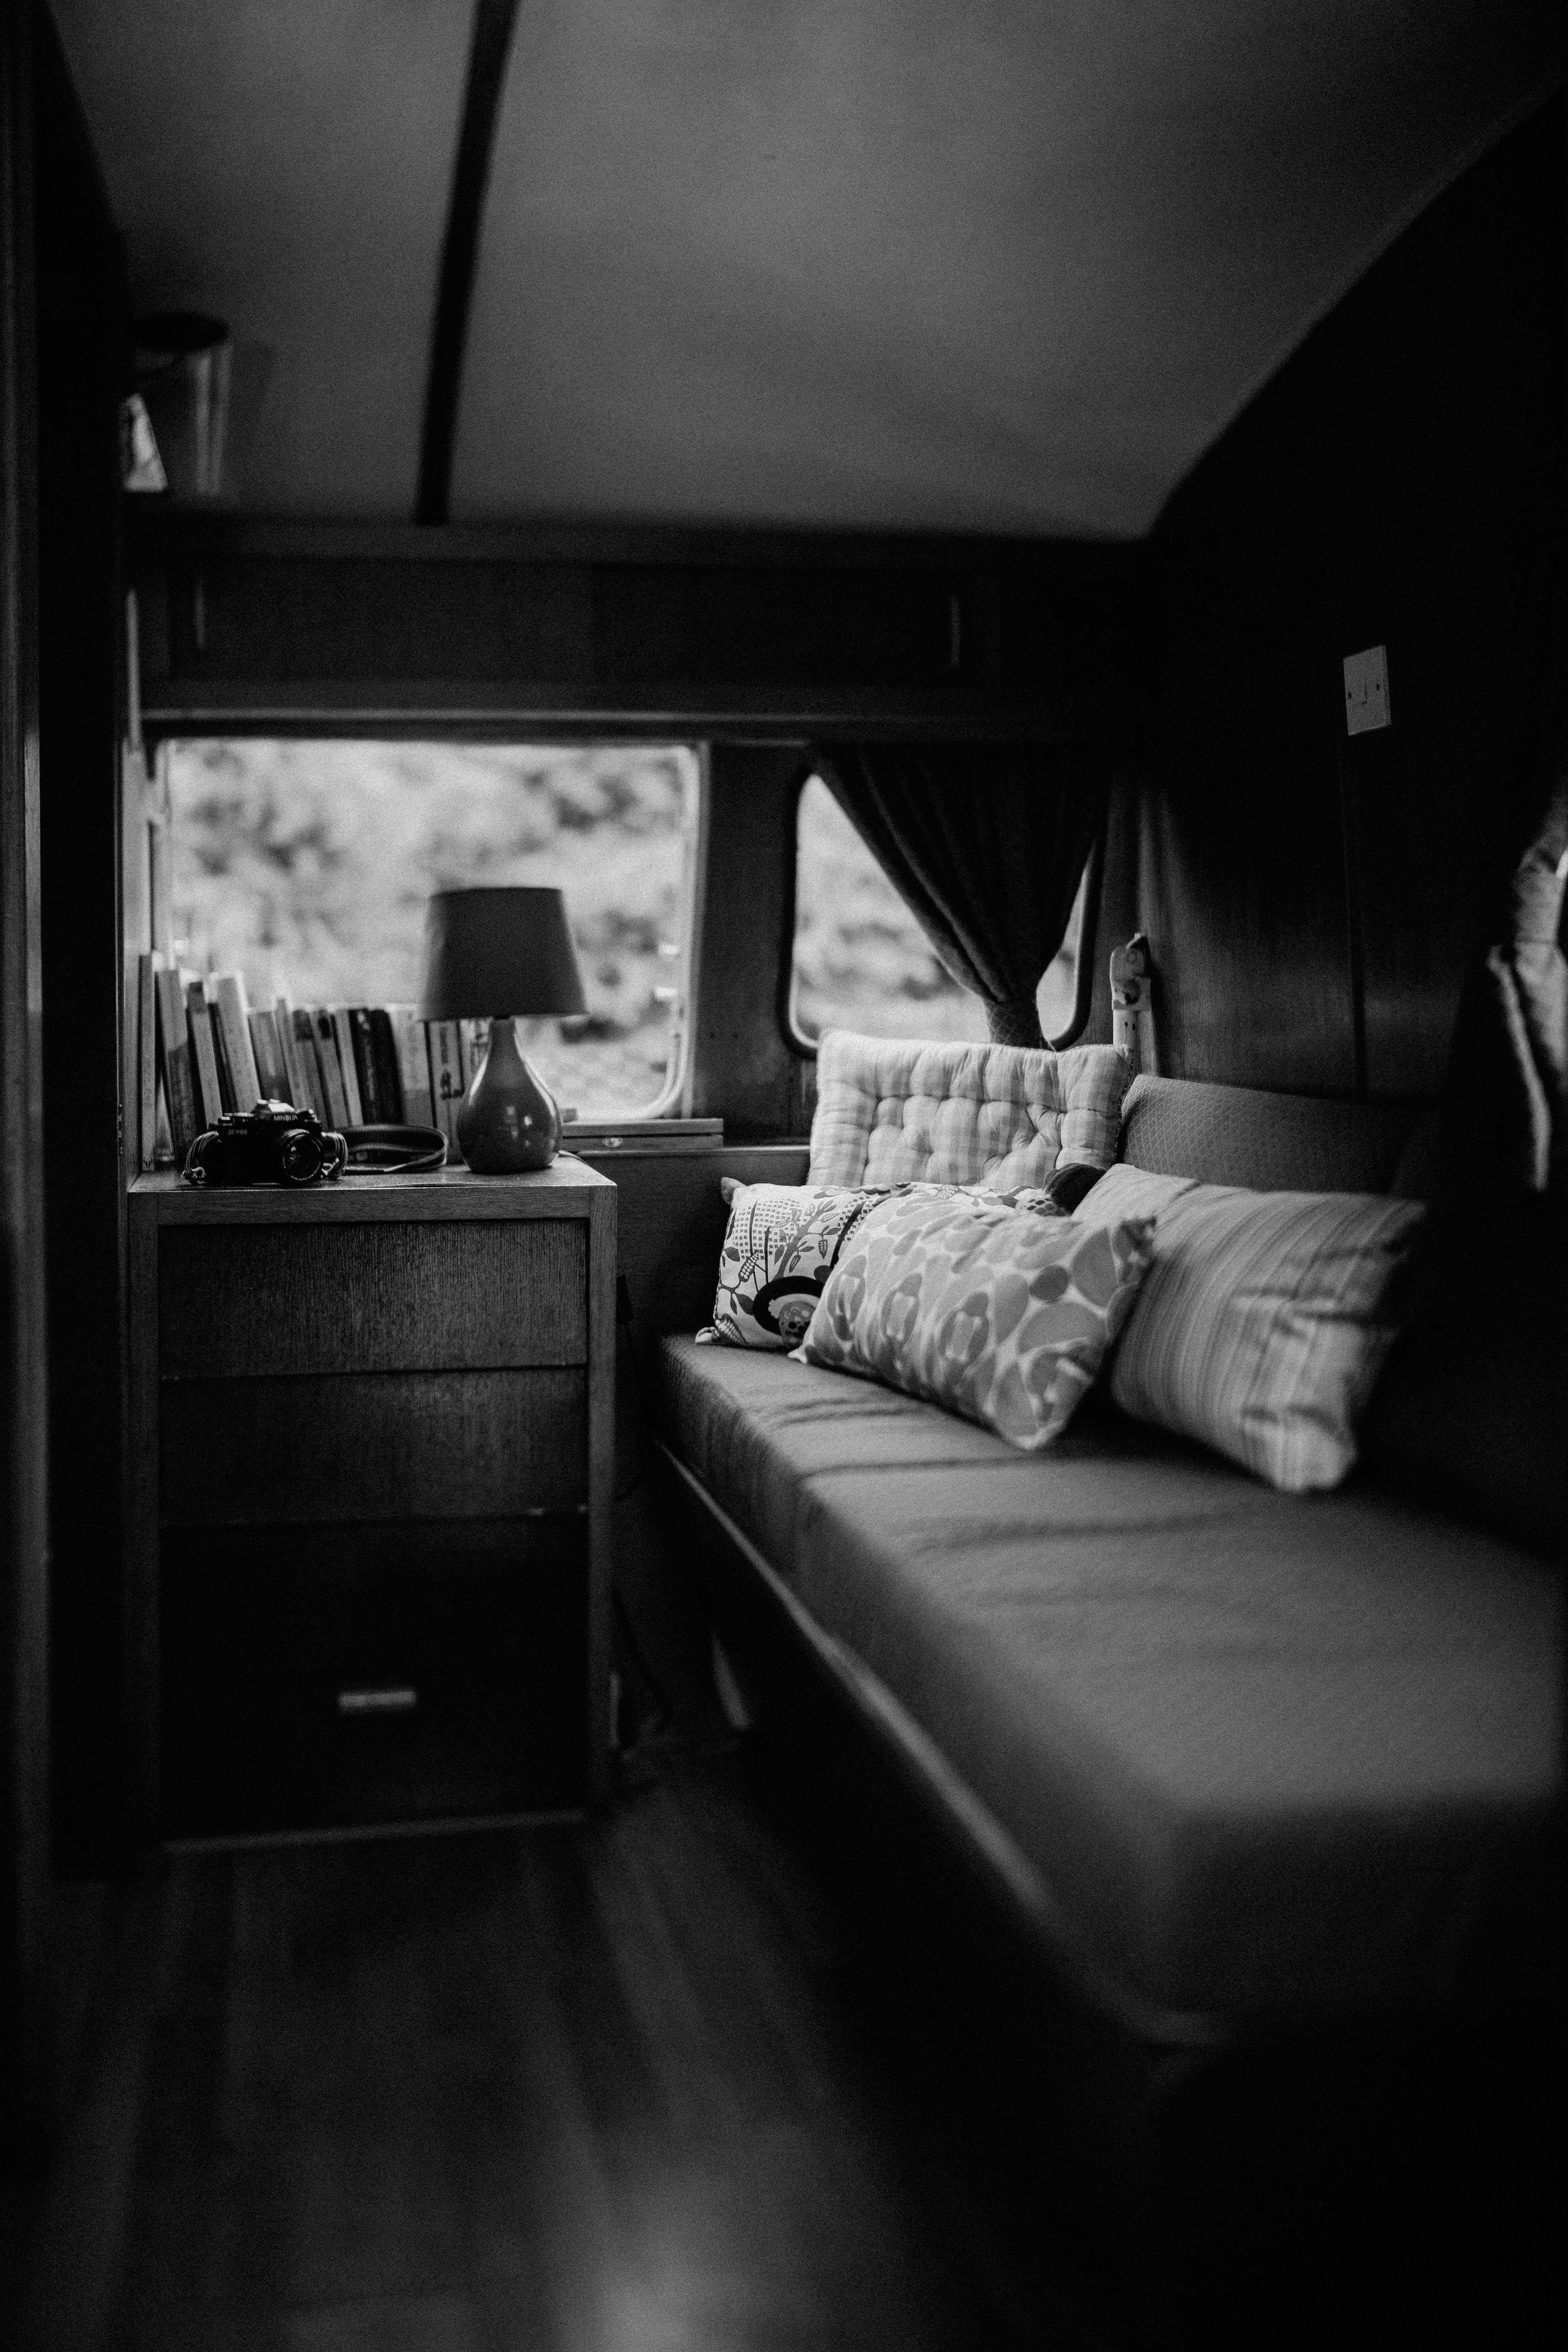 ireland-camper-8638.jpg